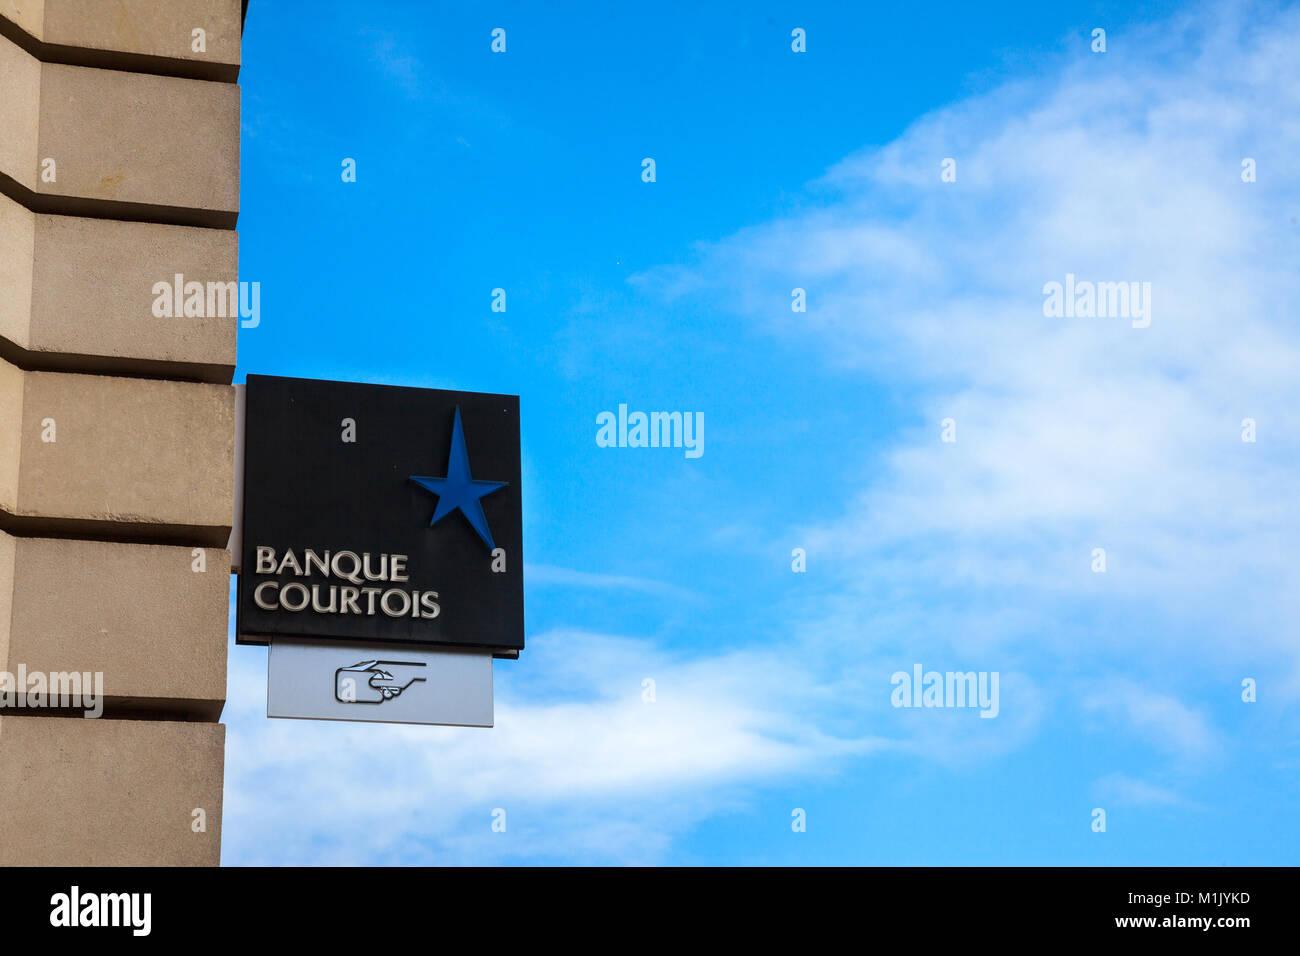 BORDEAUX, FRANCE - DECEMBER 27, 2017: Banque Courtois Logo on their main office in Bordeaux.  Banque Courtois is - Stock Image